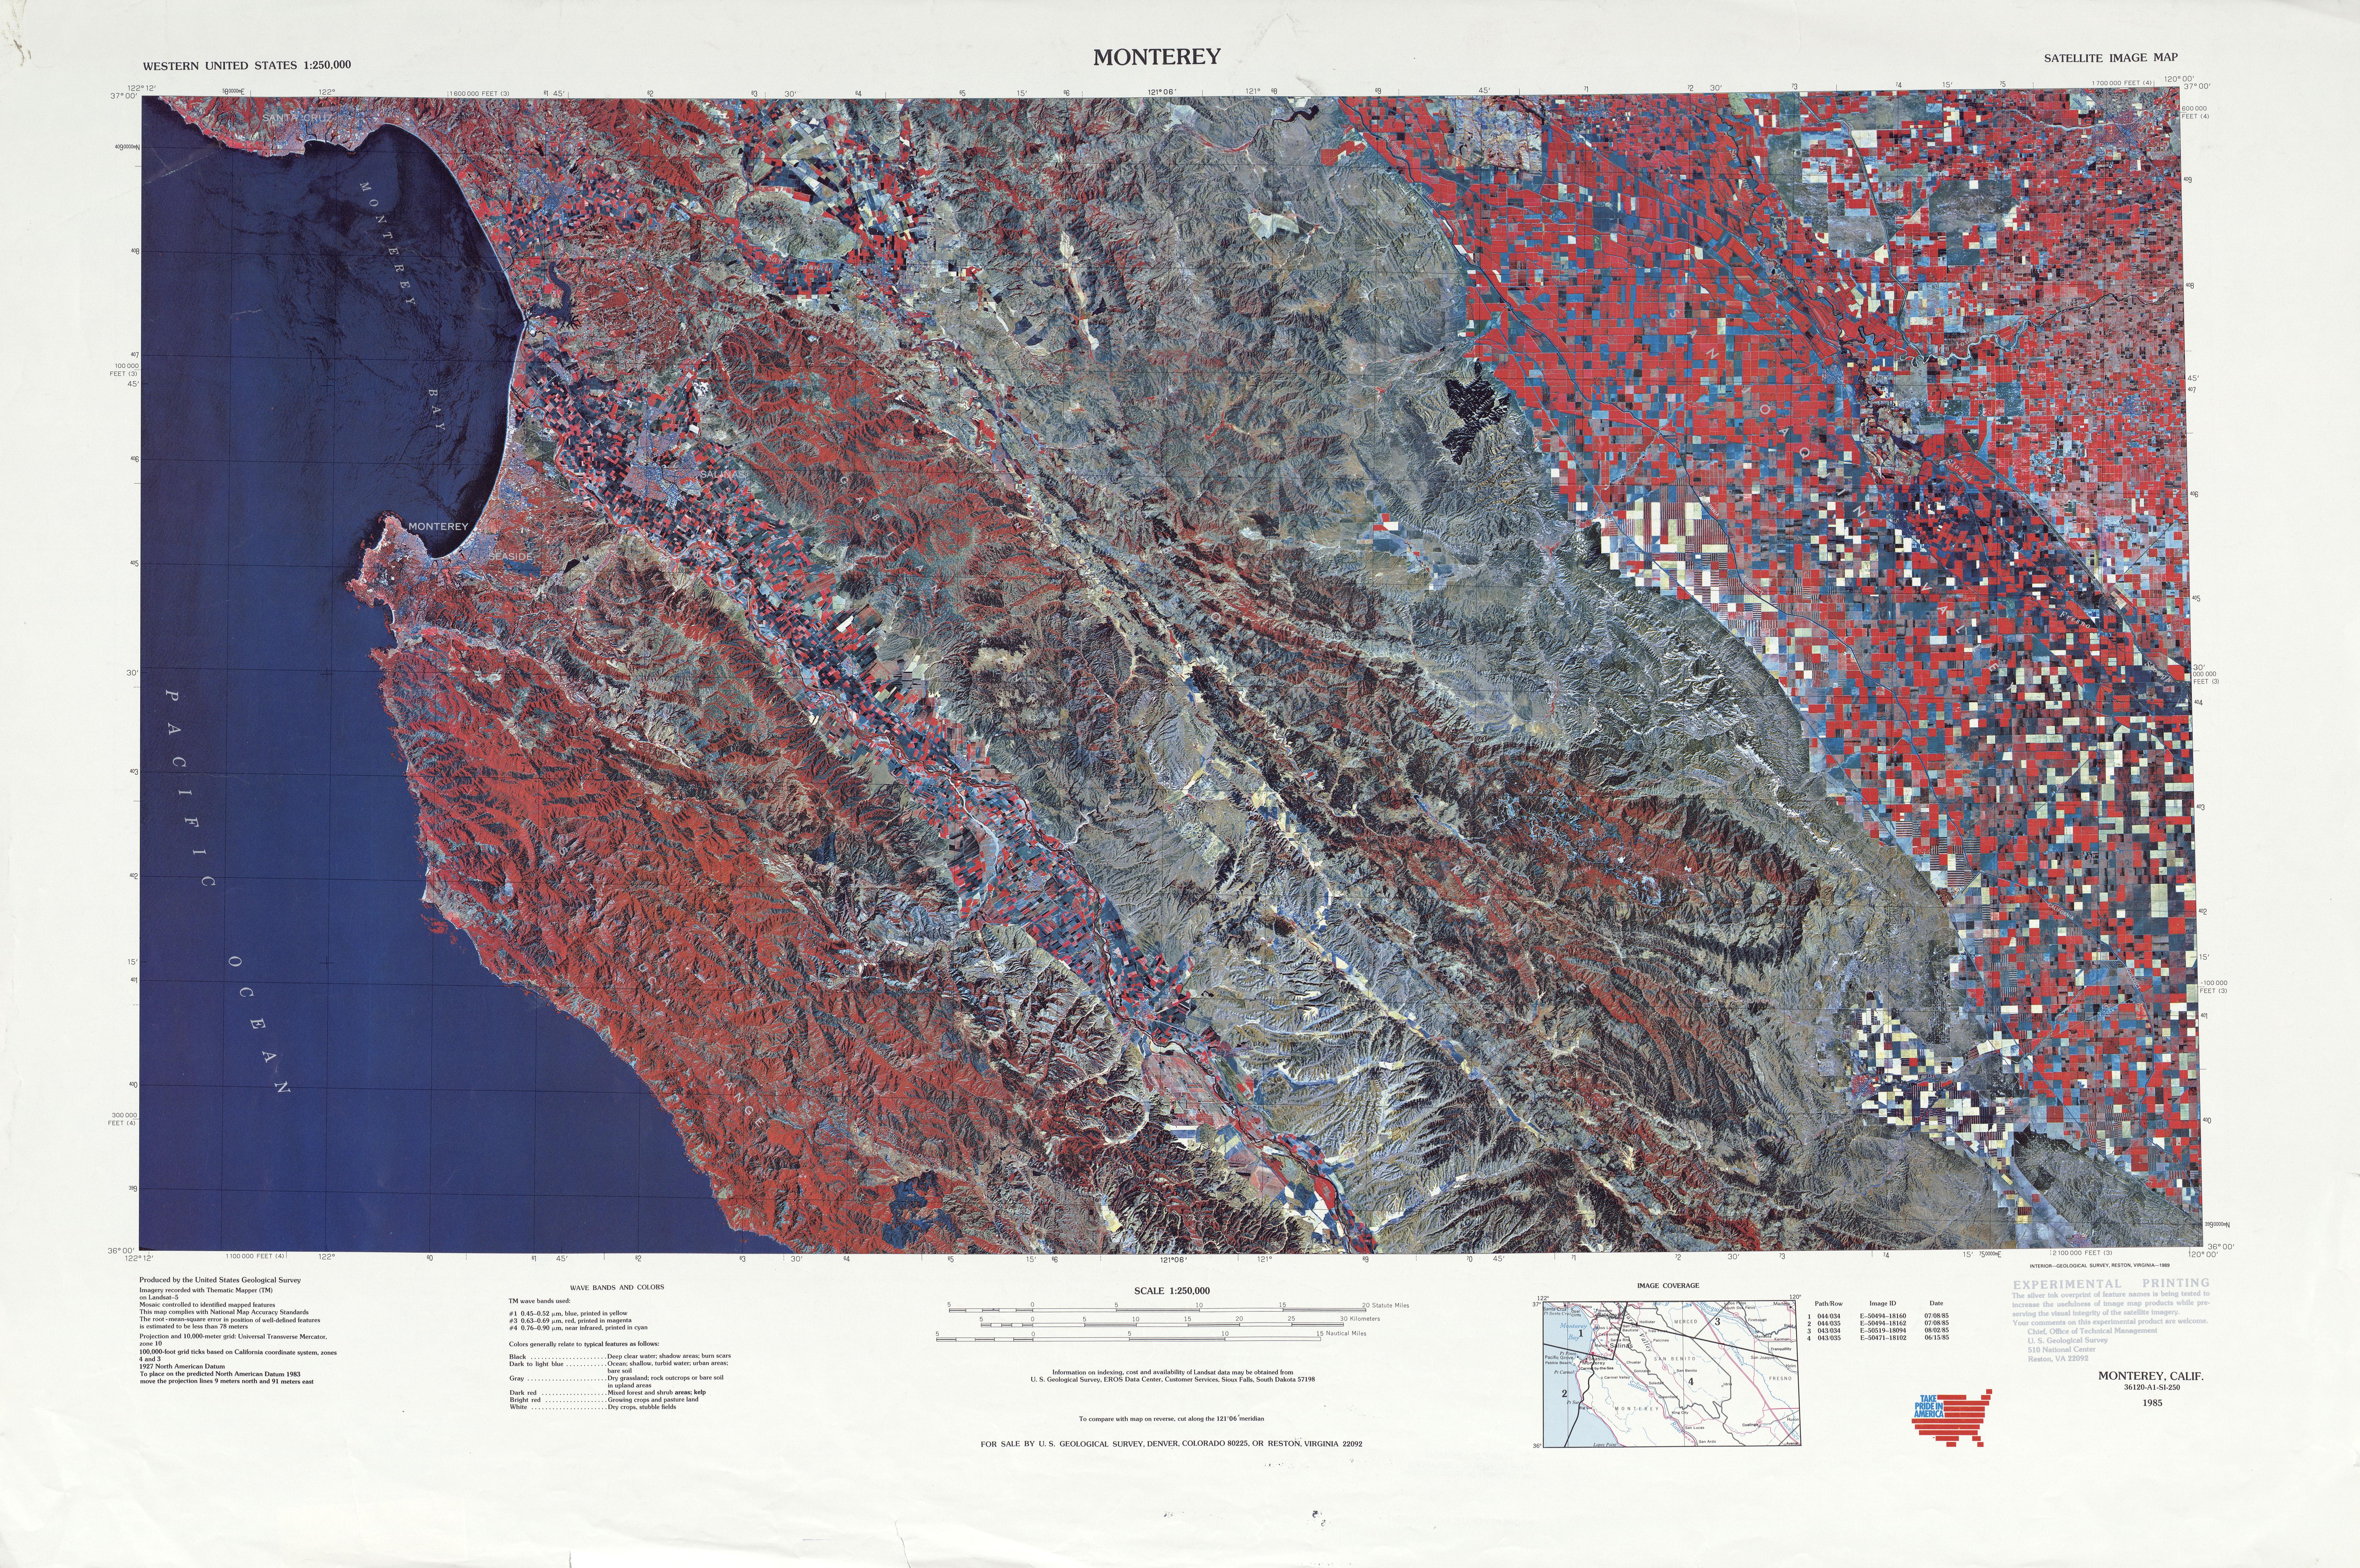 Monterey Satellite Image Sheet, United States 1985